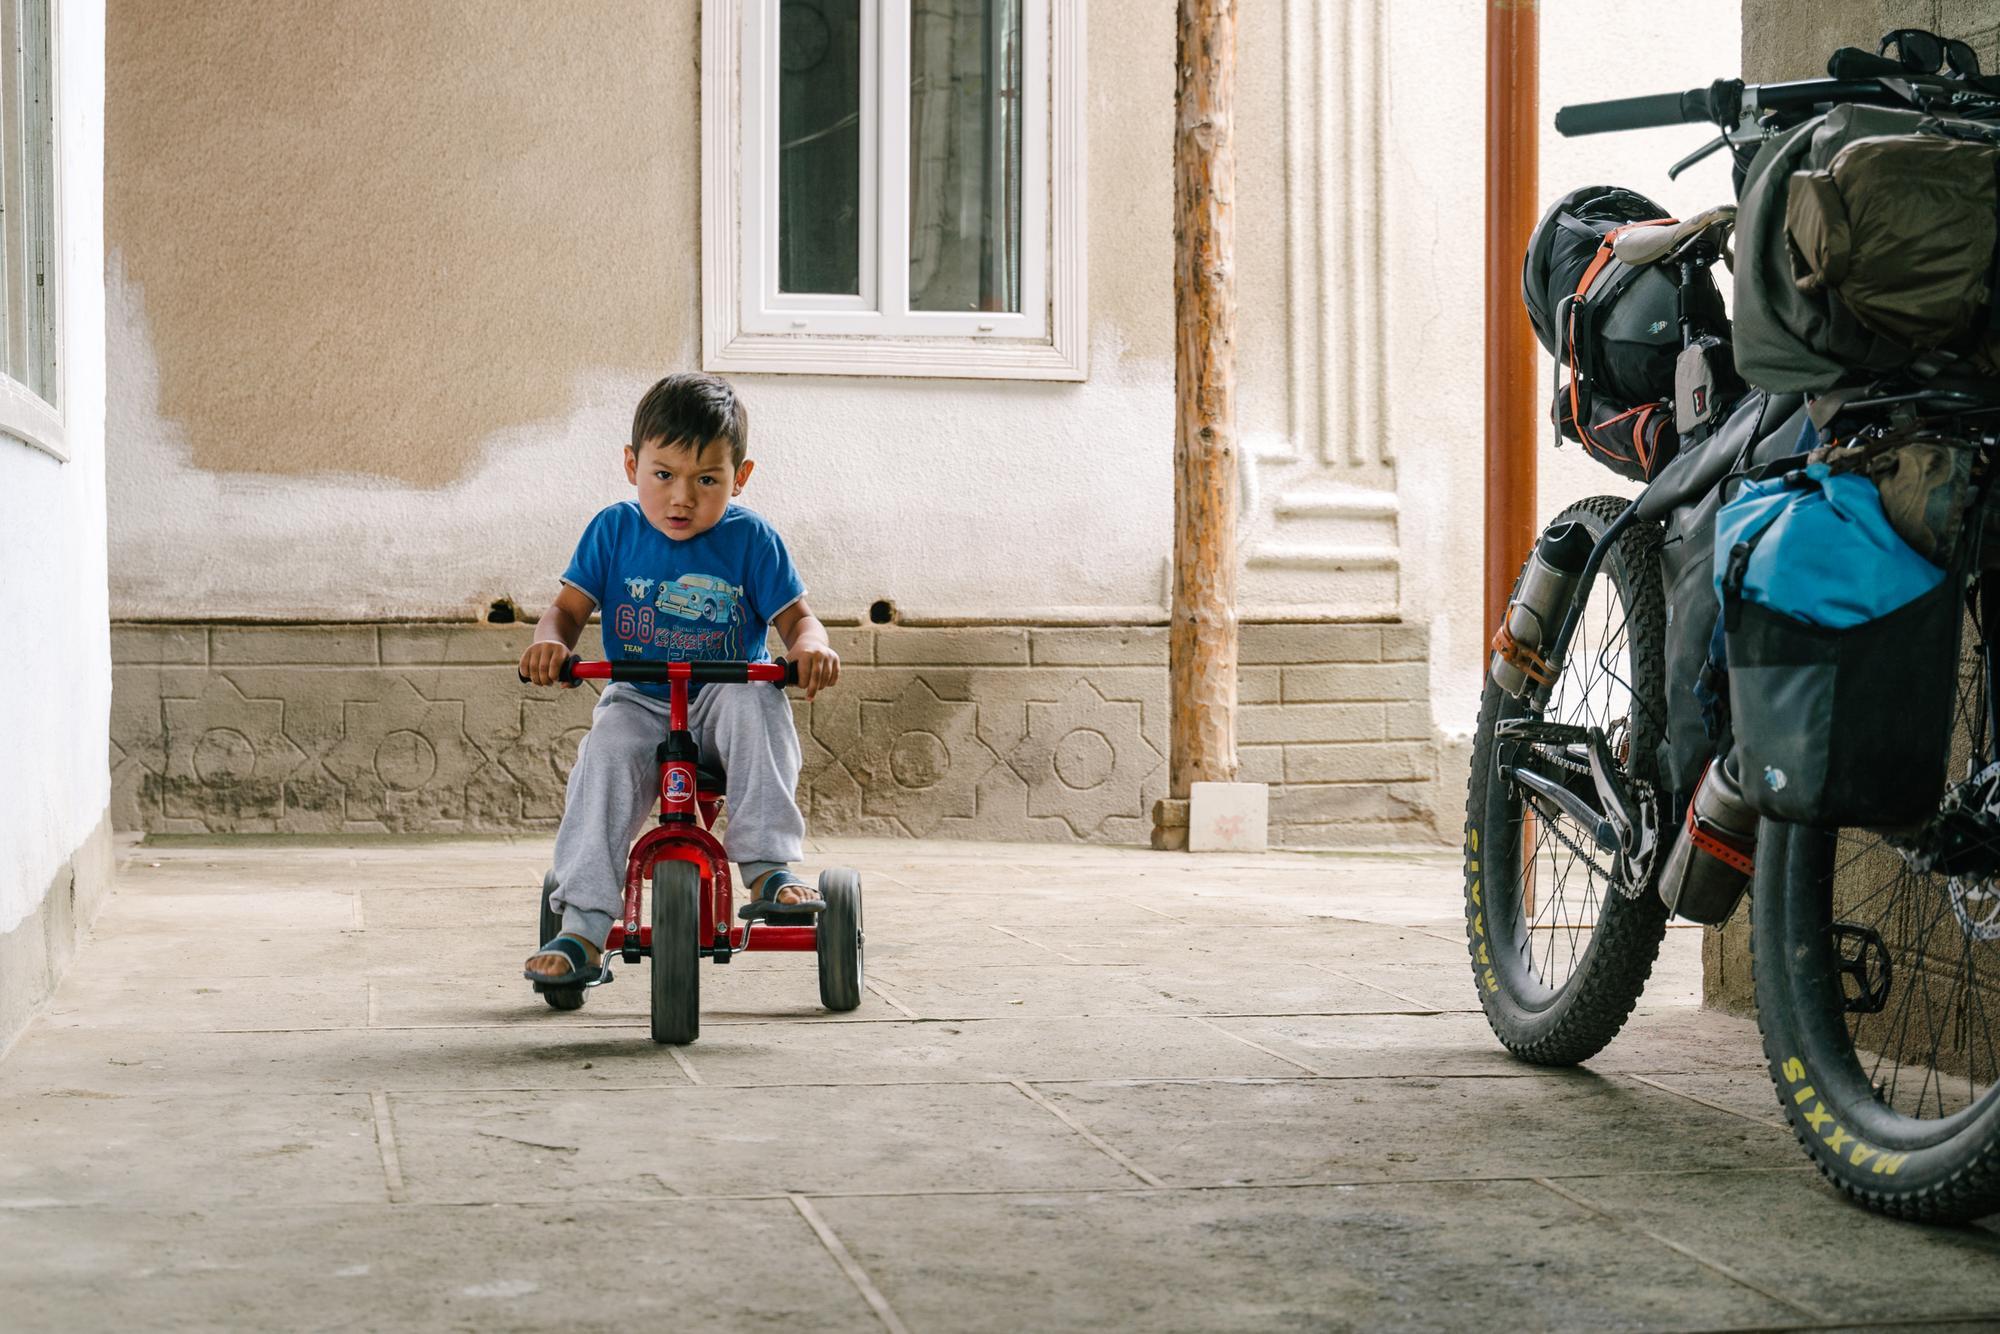 Future Silk Road Mountain Racer